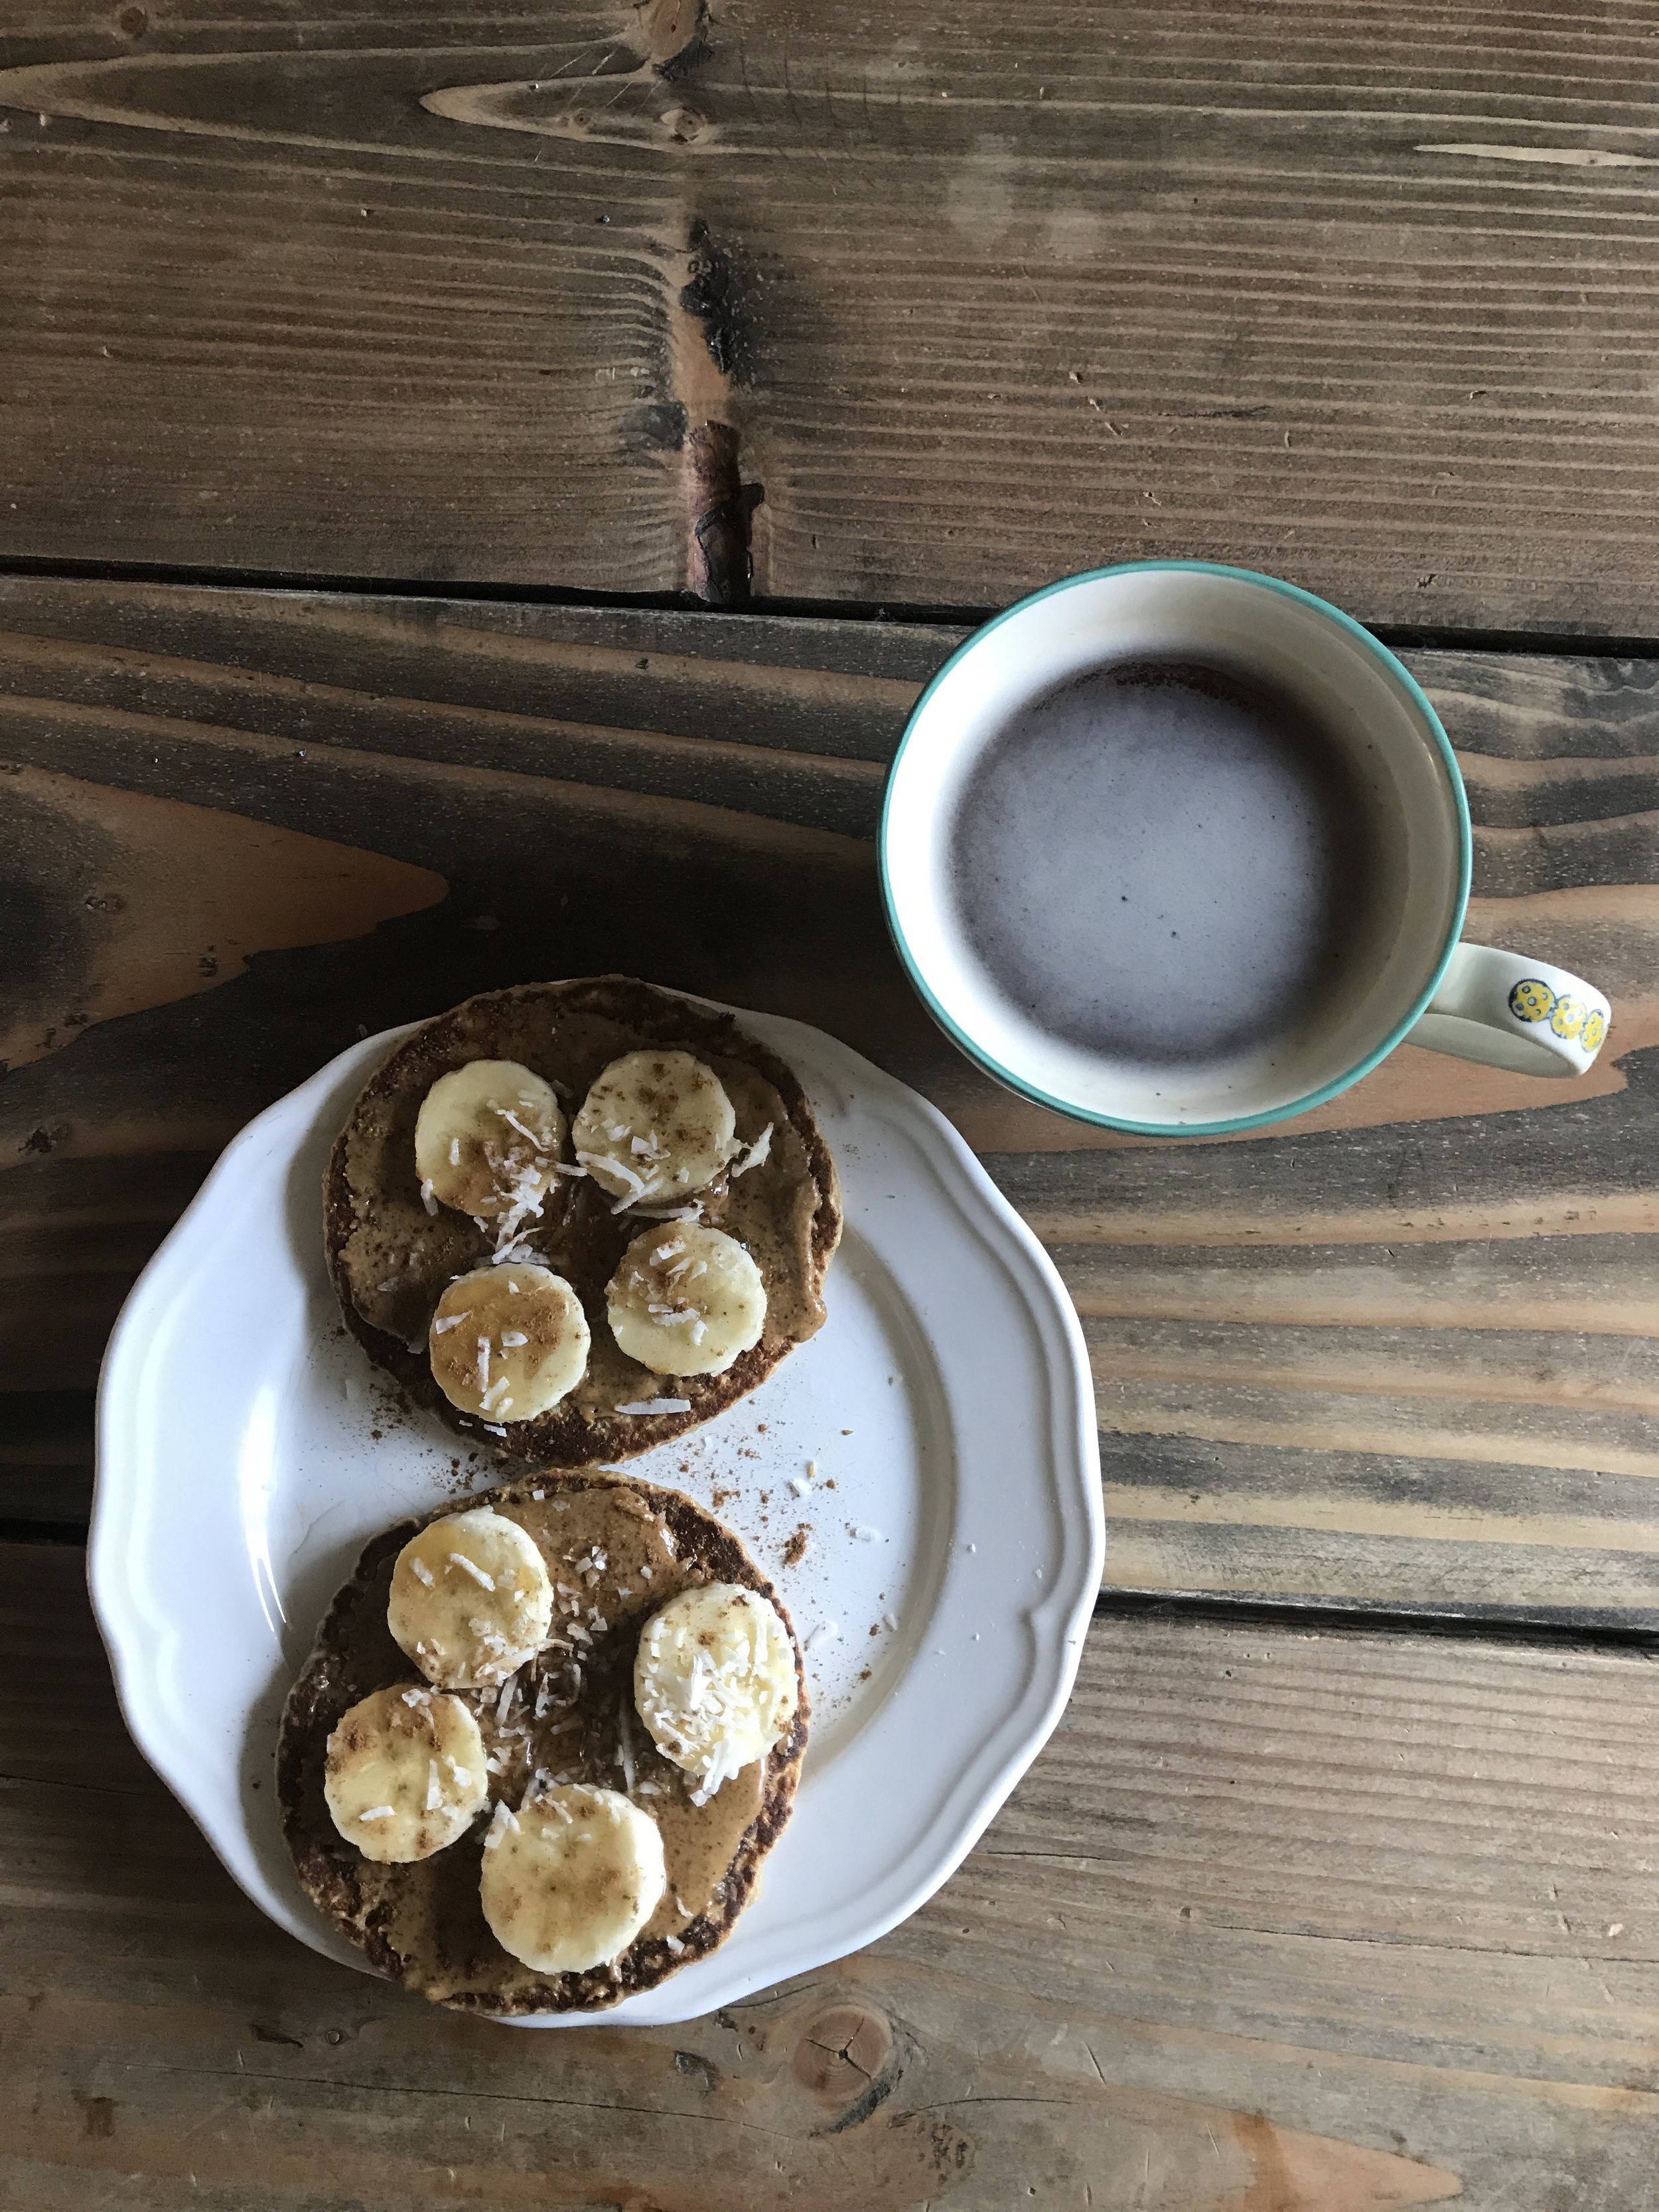 Recipe for these pancakes is here:https://www.kimscravings.com/banana-oat-blender-pancakes/